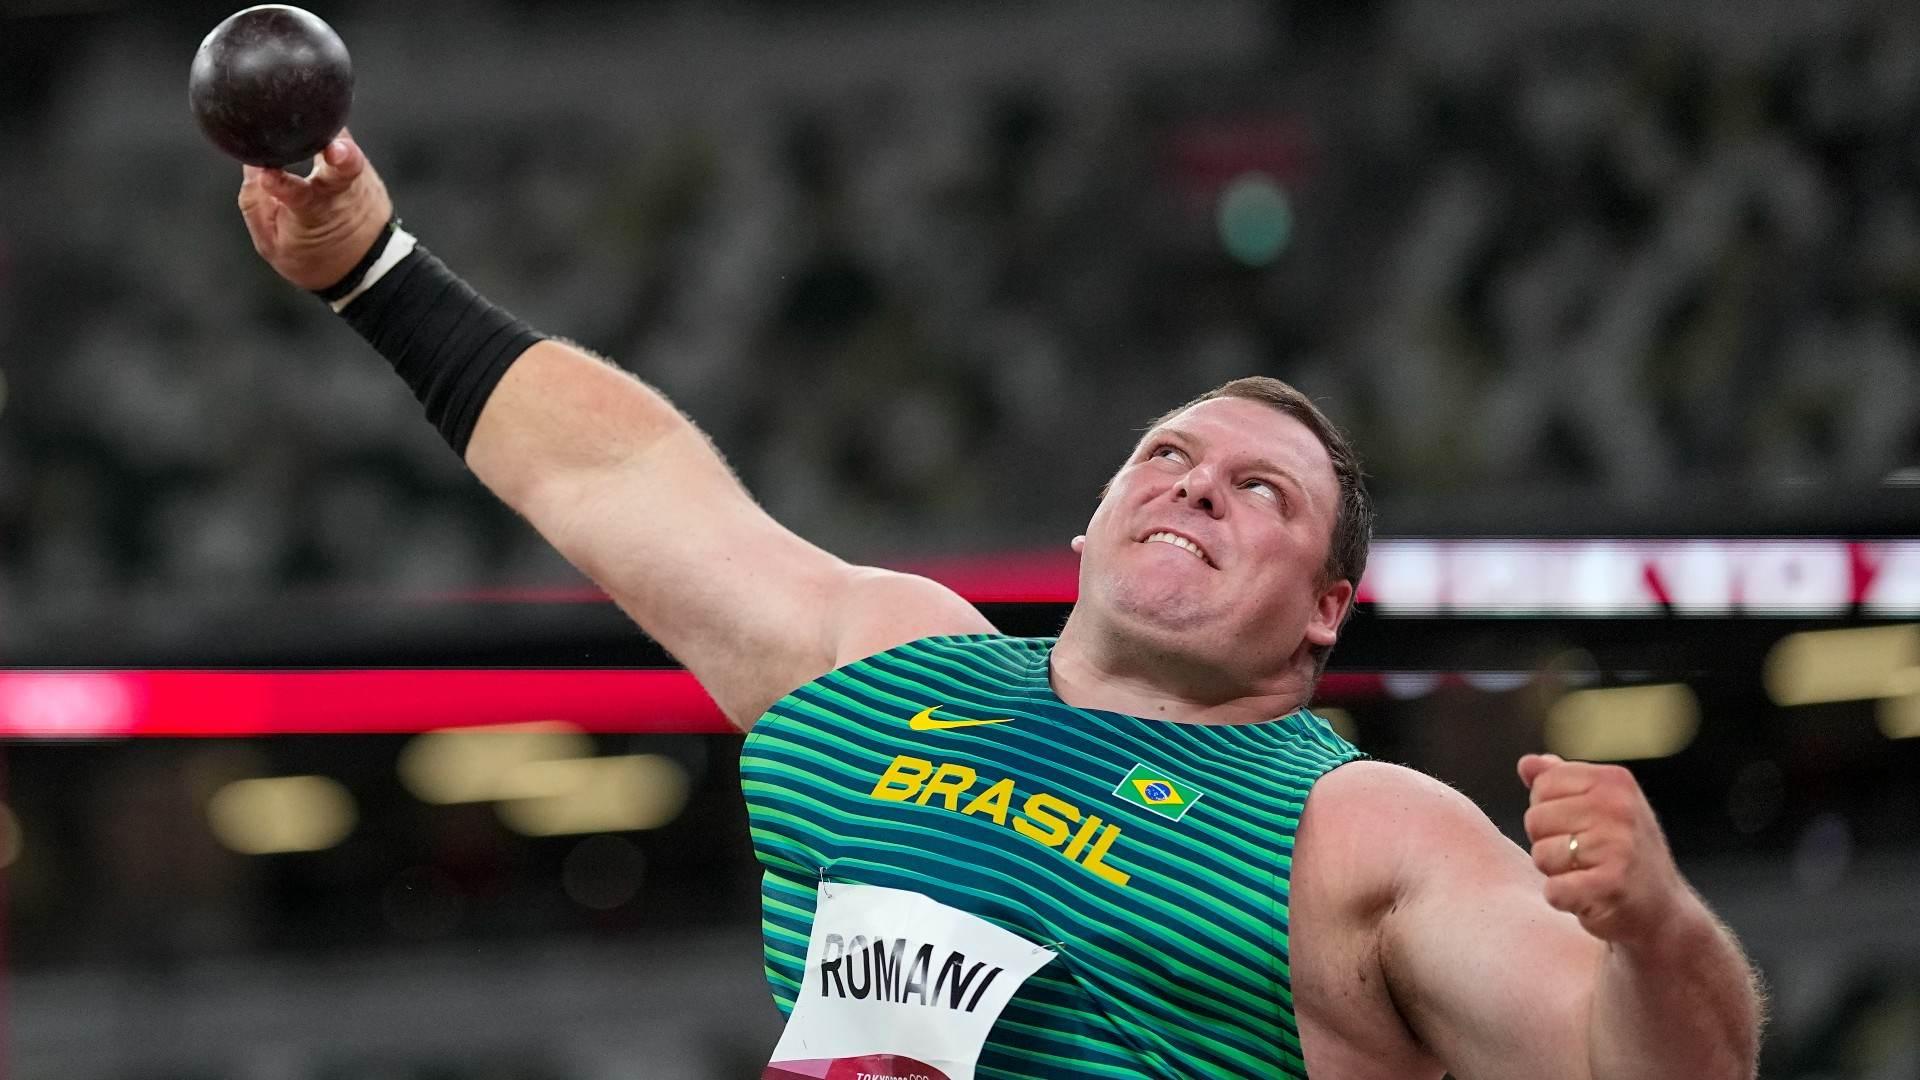 Darlan Romani arremessou peso a 21,31m e se classificou para final olímpica